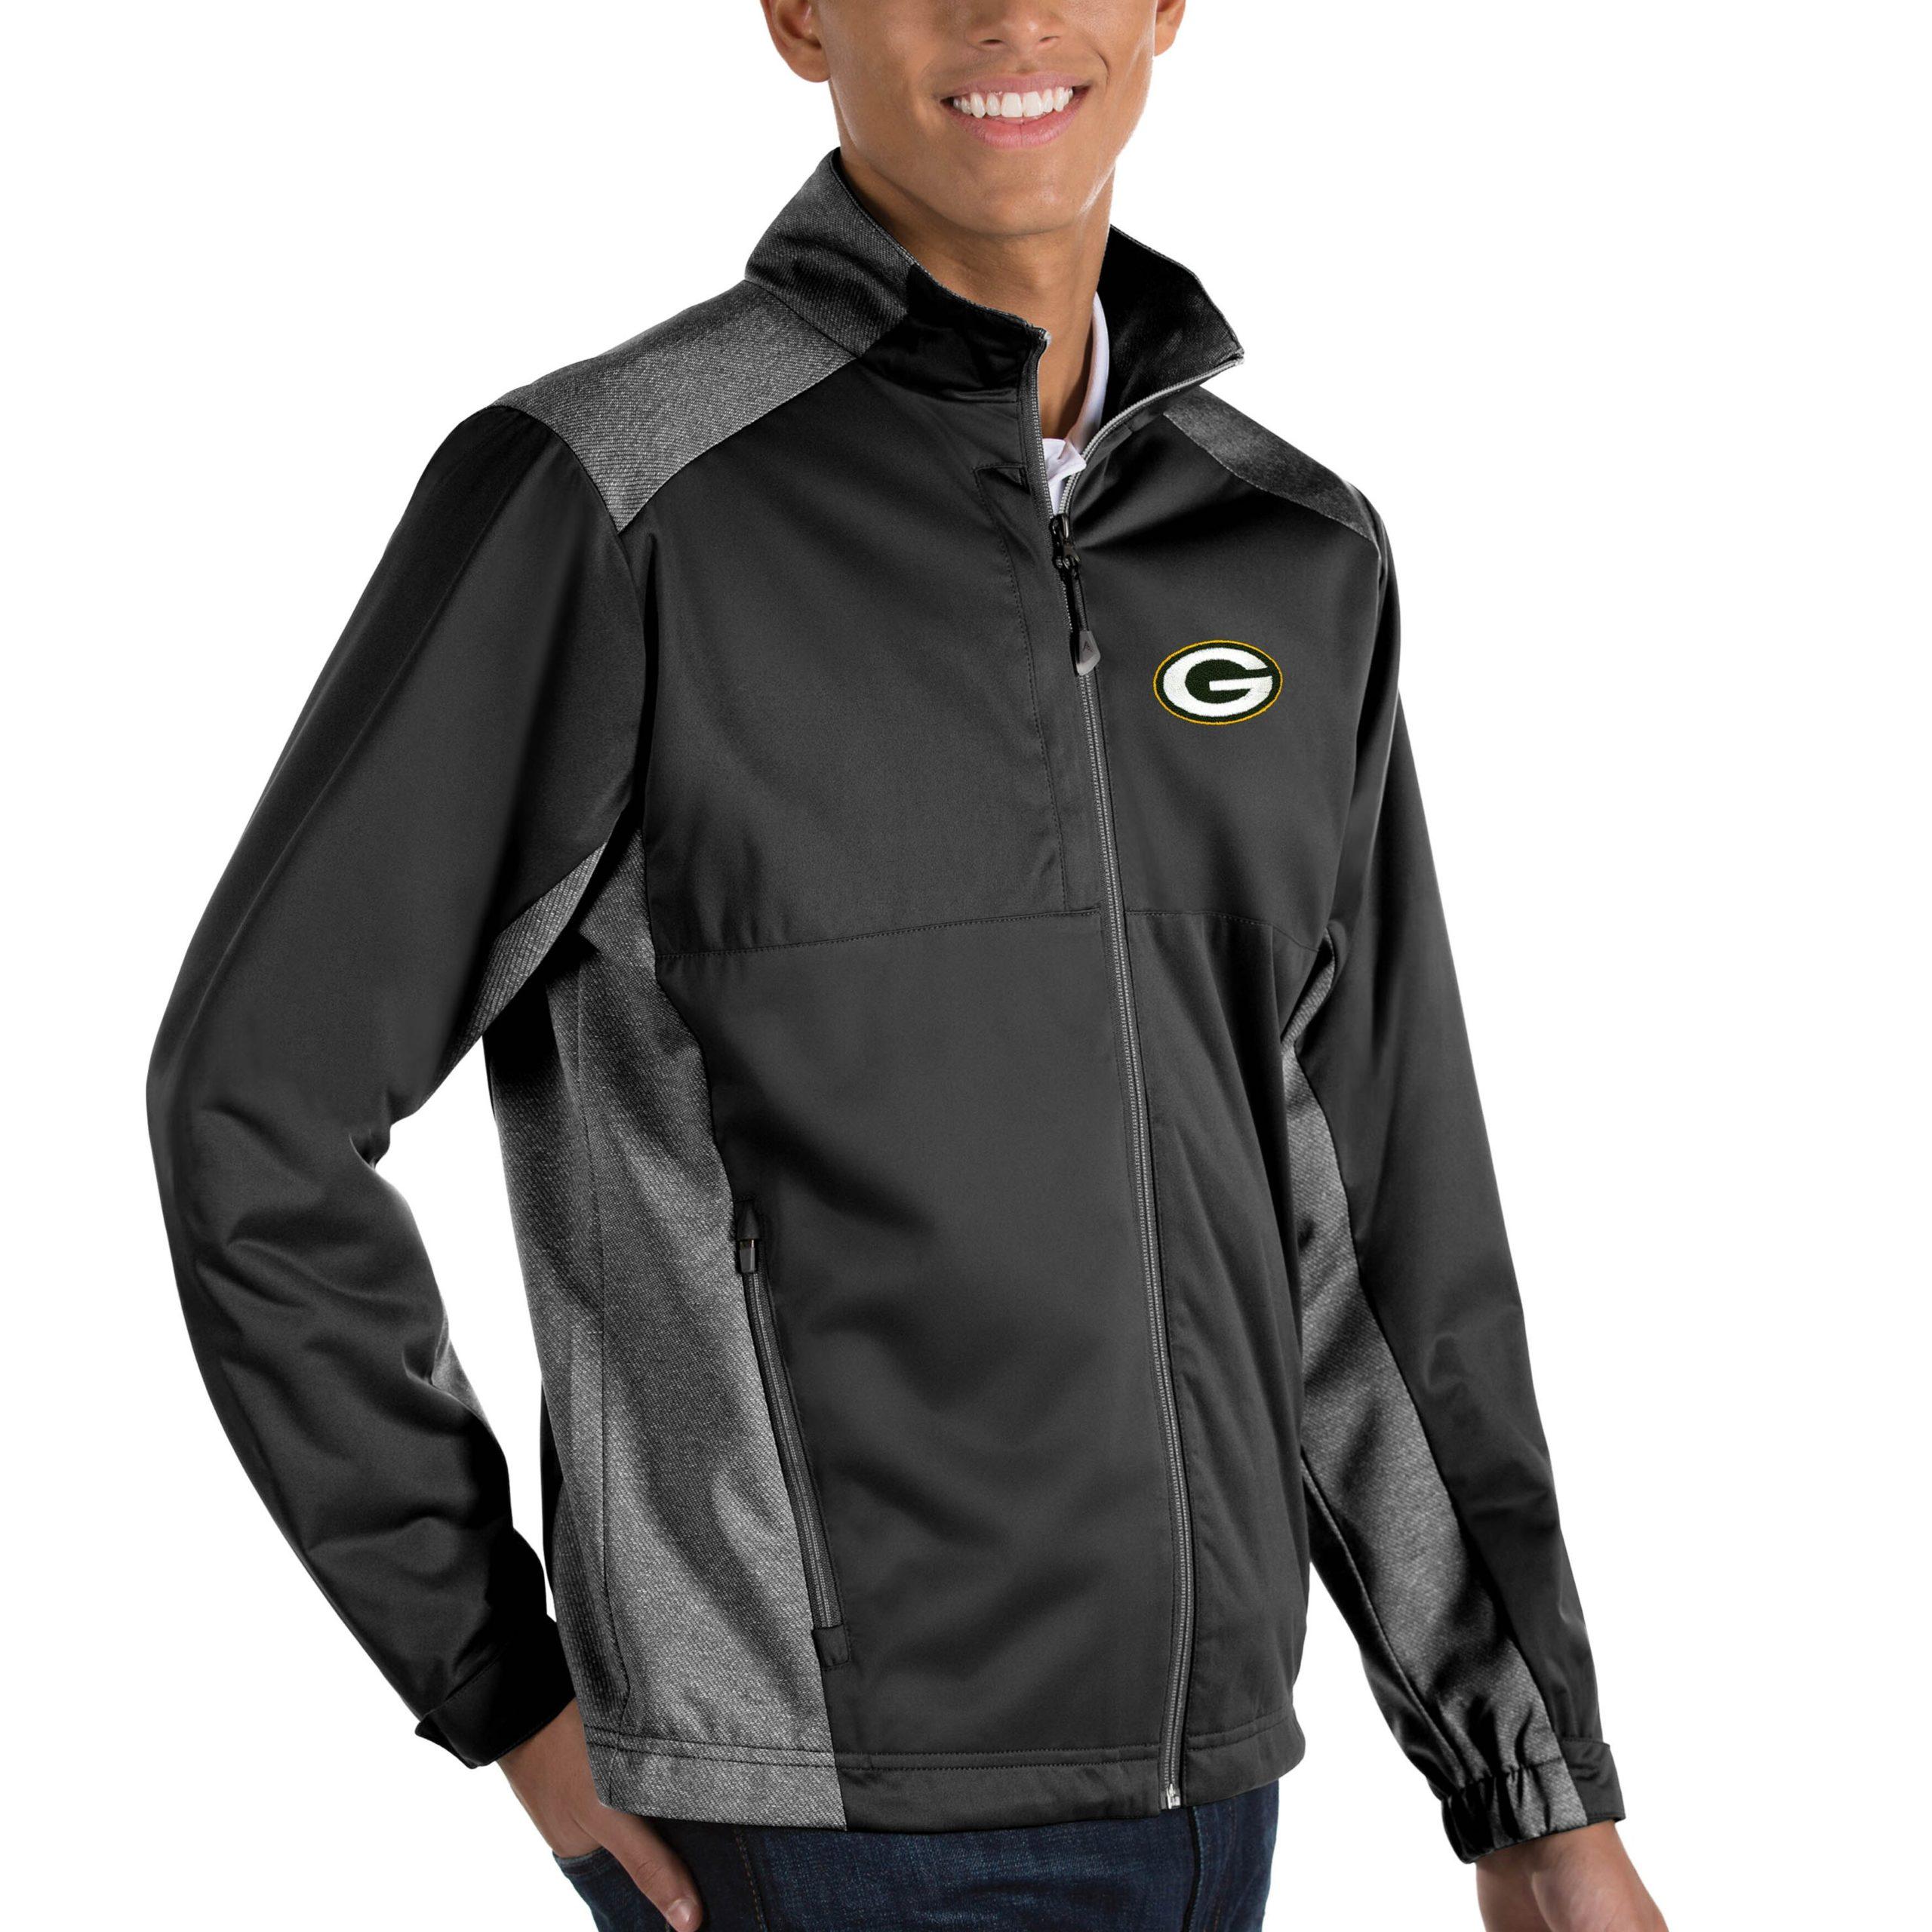 Green Bay Packers Antigua Revolve Big & Tall Full-Zip Jacket - Heather Black